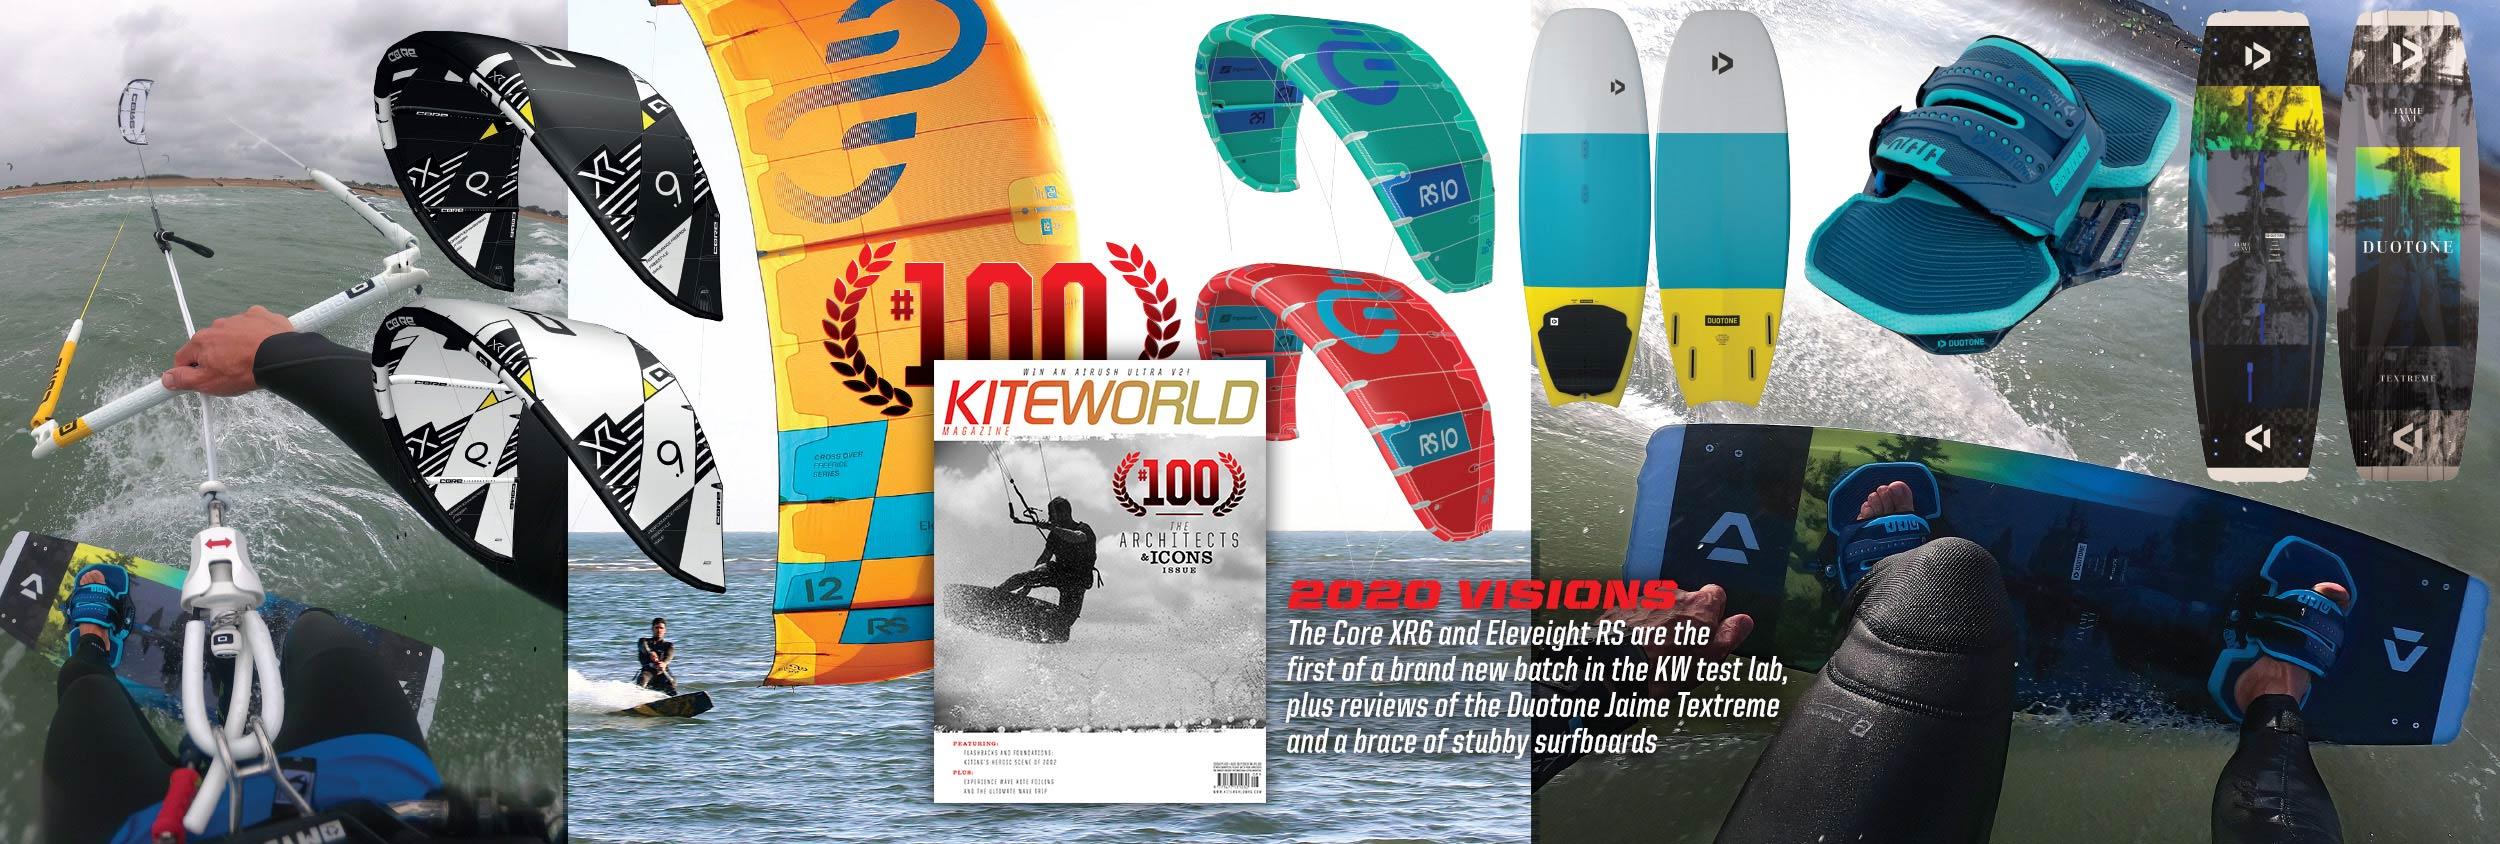 Kiteworld issue 100 2020 kite tests